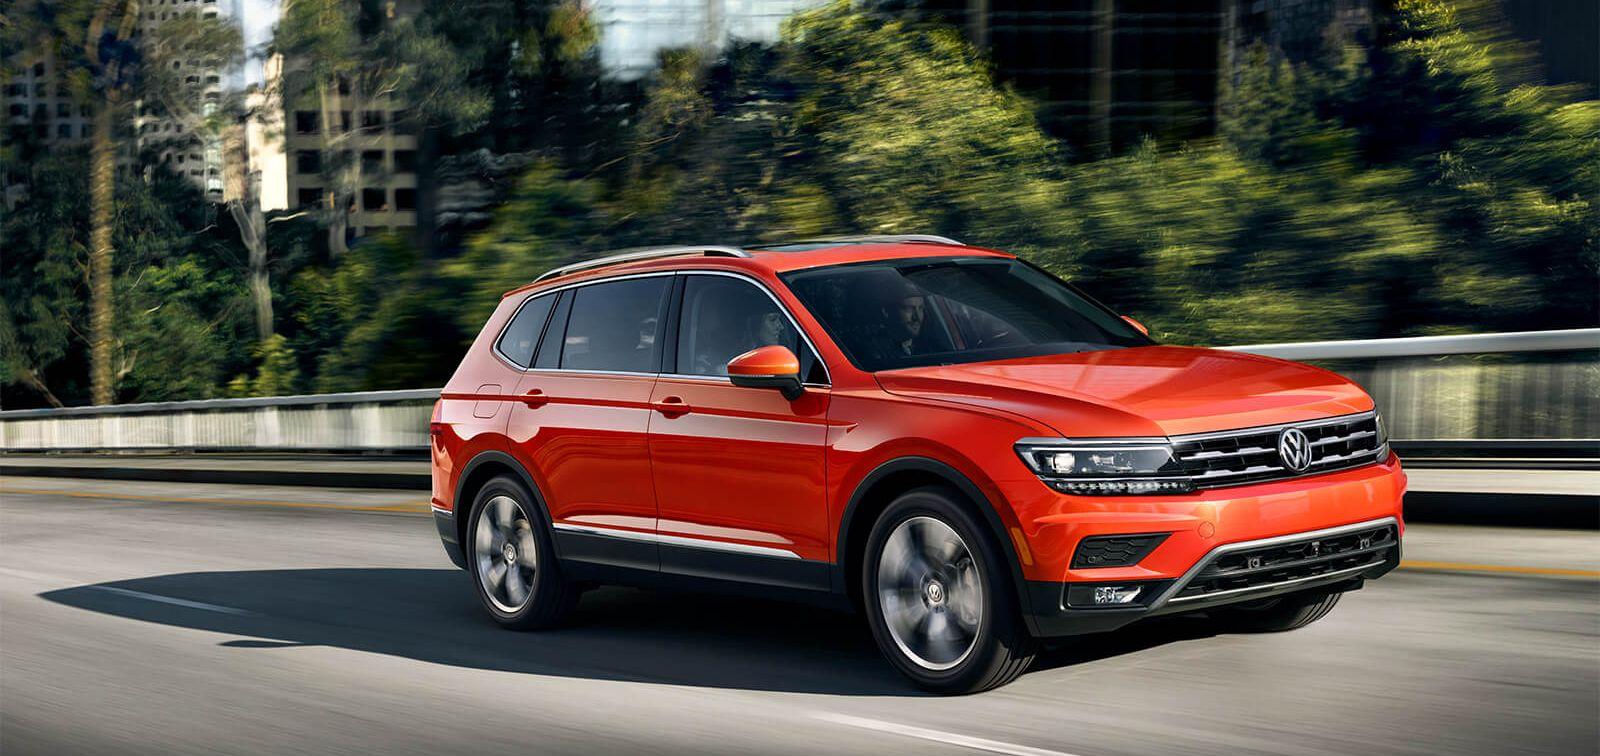 2019 Volkswagen Tiguan Leasing near Silver Spring, MD